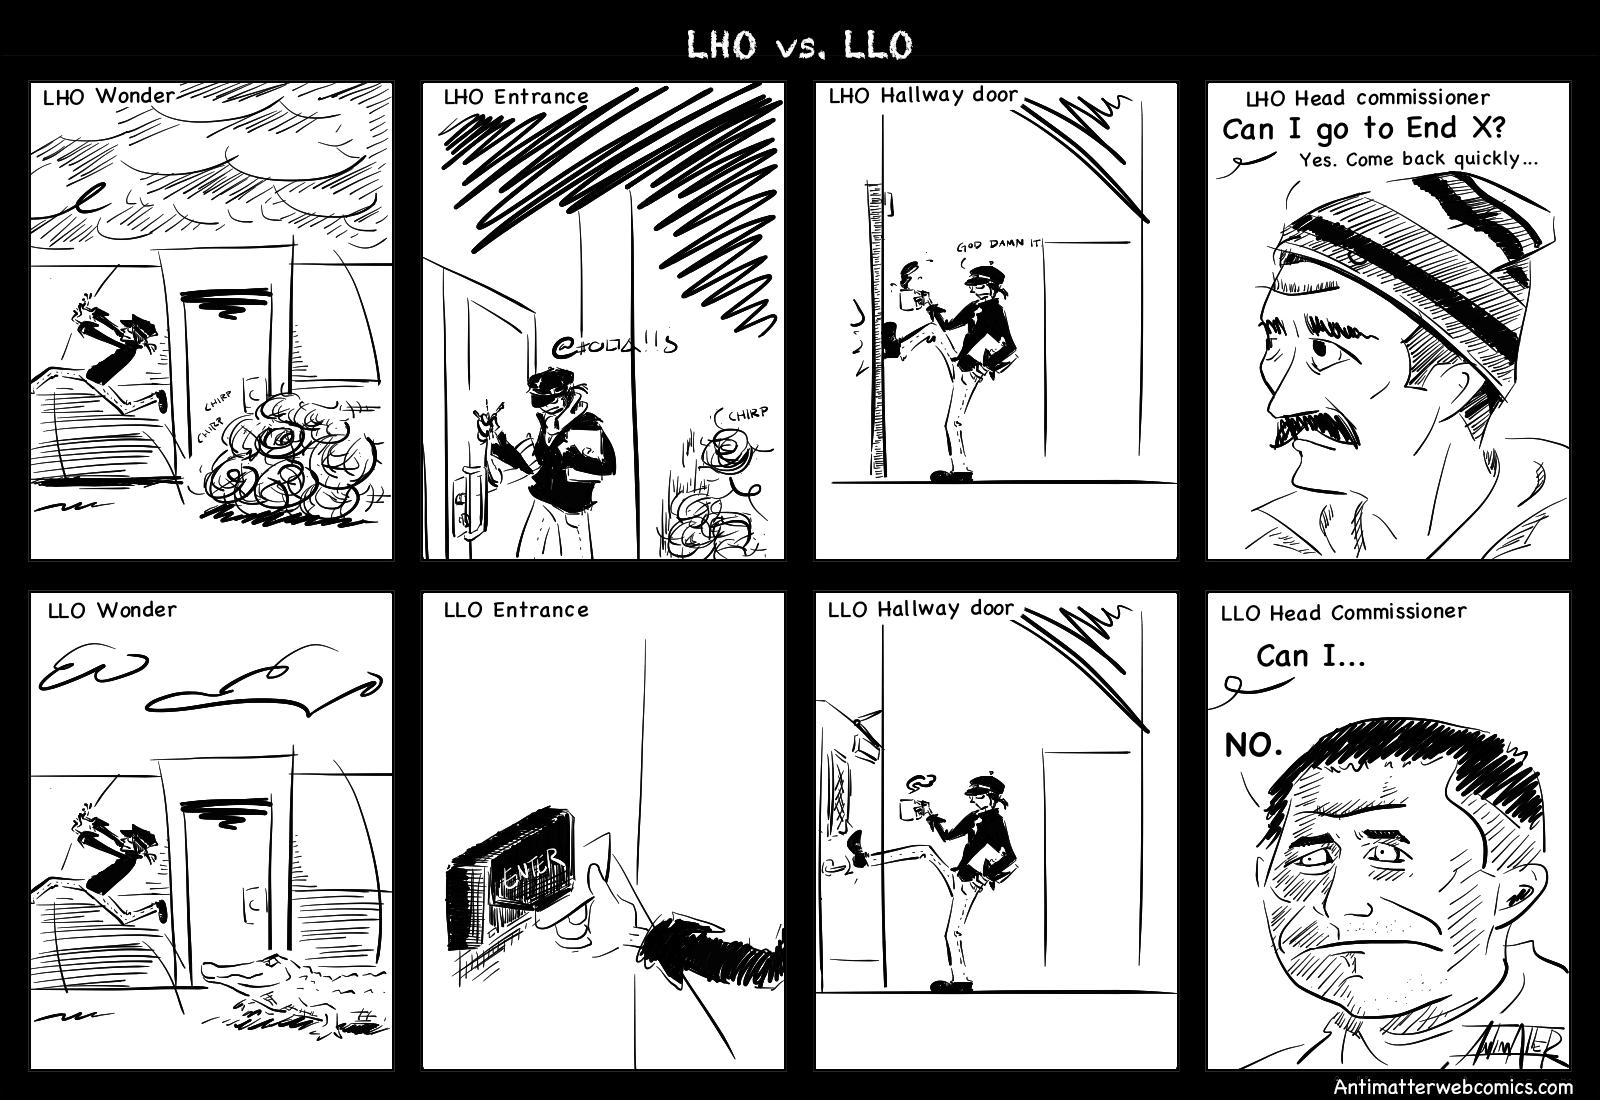 LHO vs. LLO